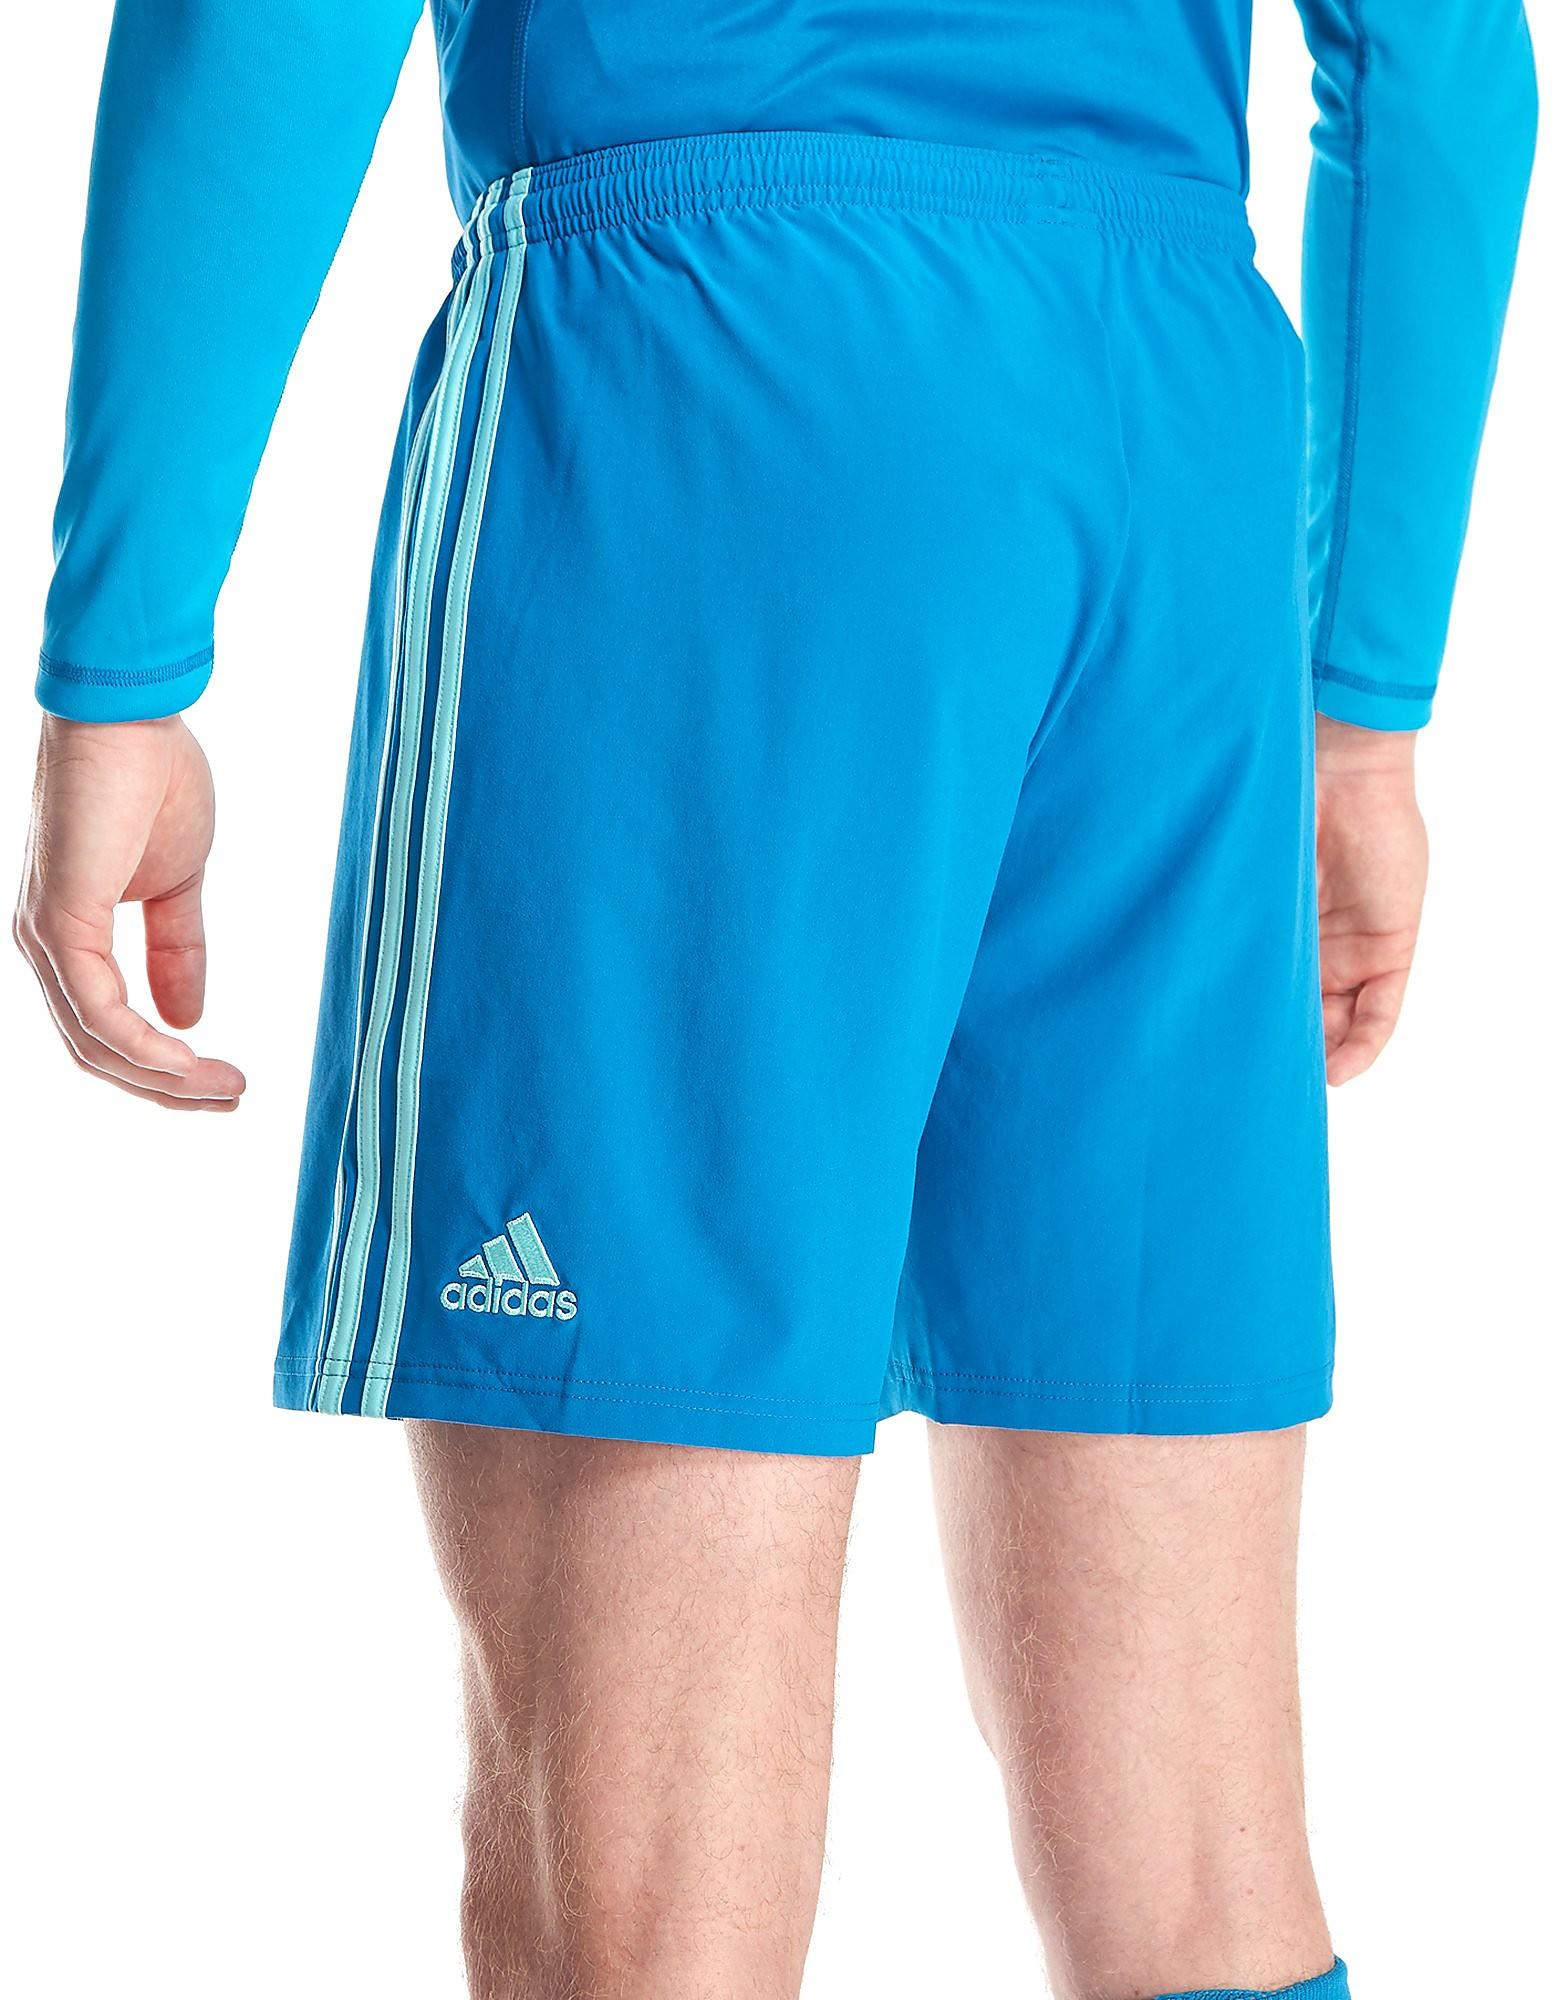 adidas Wales 2018 Home Goalkeeper Shorts